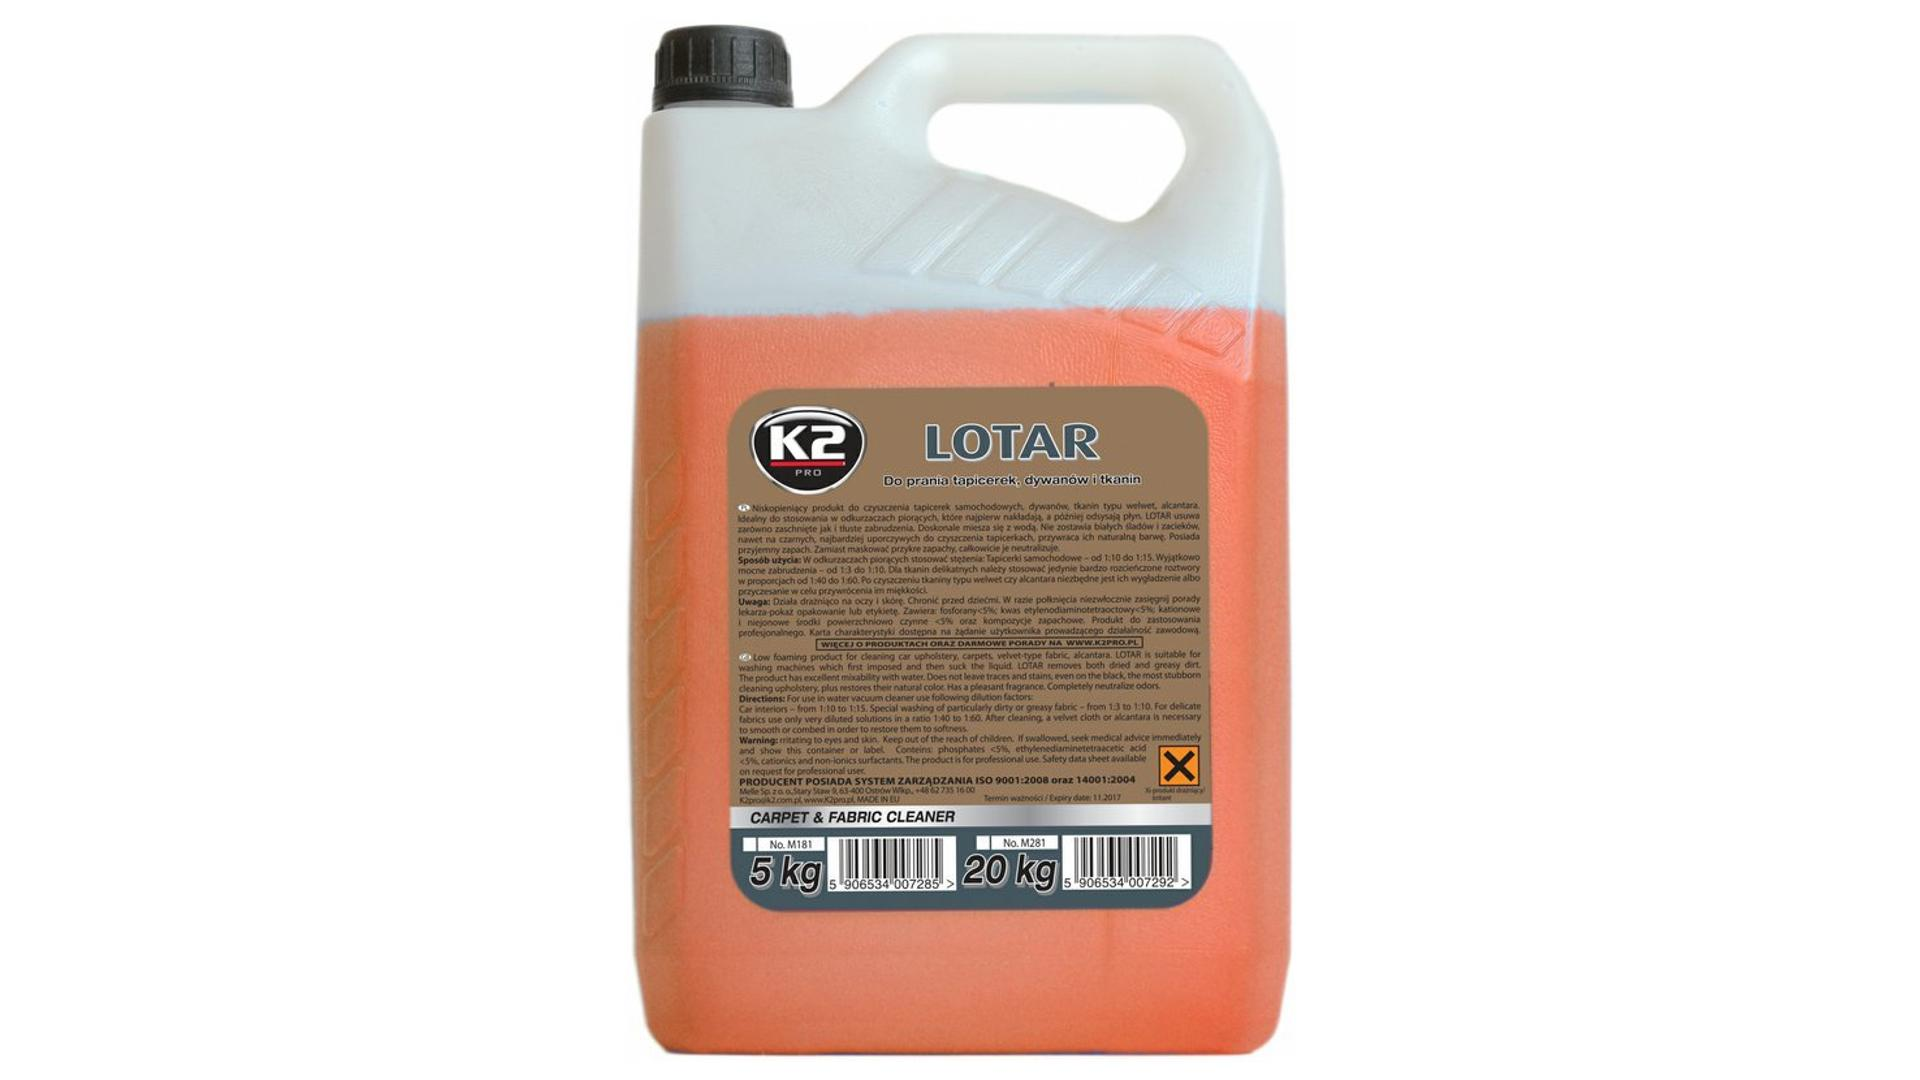 K2 LOTAR 5kg - čístí koberce a tkaniny